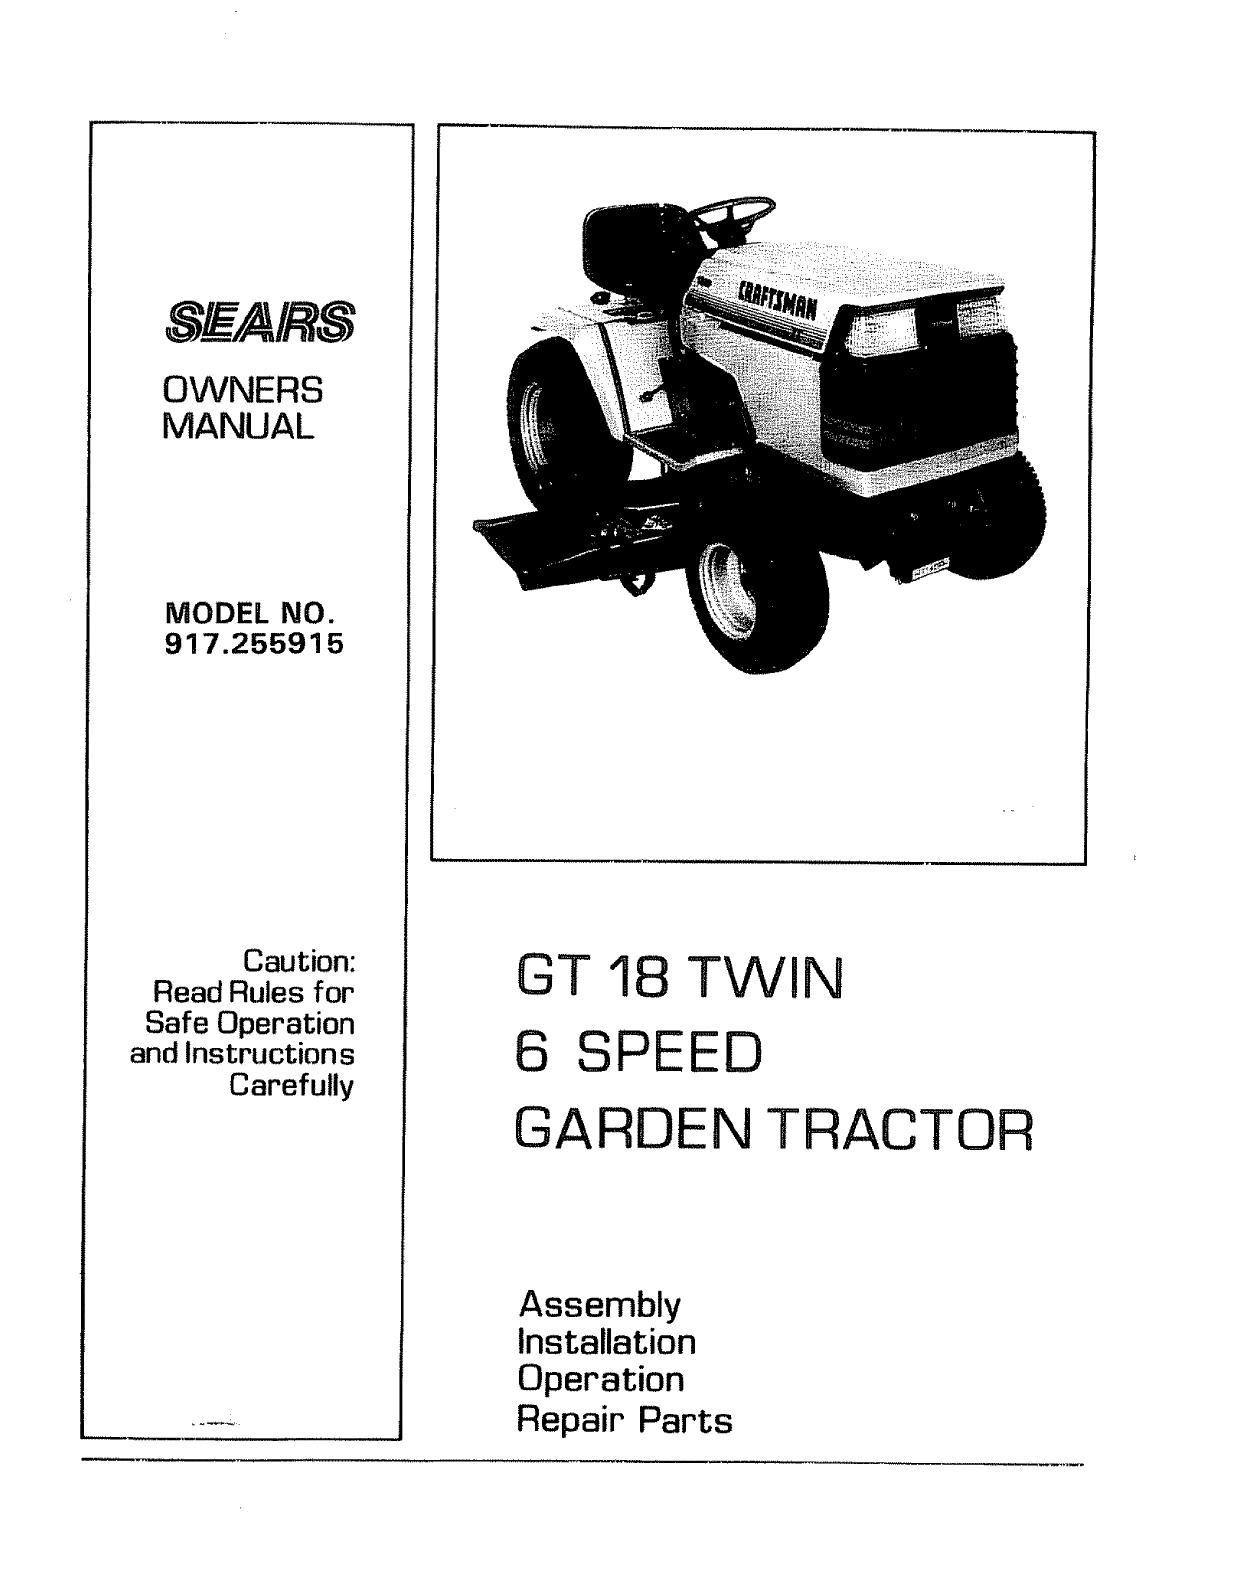 [DIAGRAM_0HG]  HY_4267] Craftsman Garden Tractor Wiring Diagram Download Diagram | Wiring Diagram Sears Gt18 |  | Anth Over Jebrp Mohammedshrine Librar Wiring 101